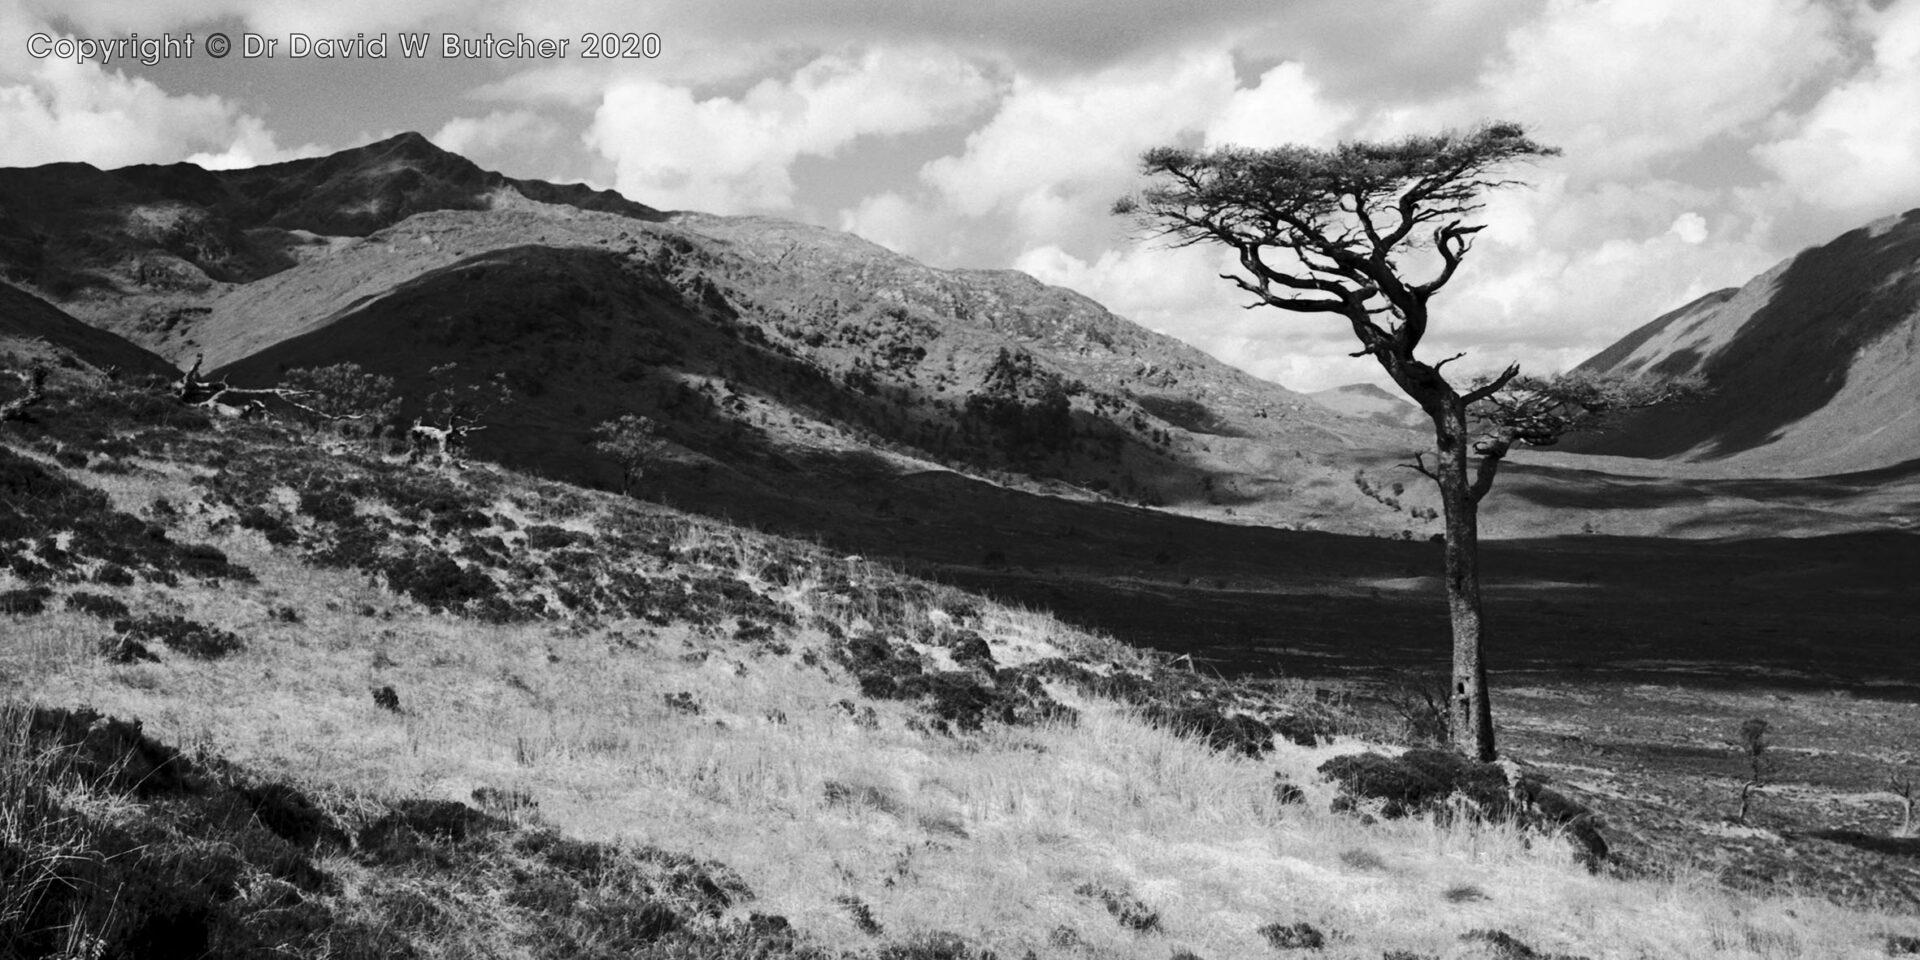 Spidean Mialach and Glen Loyne Tree, Glen Shiel, Scotland